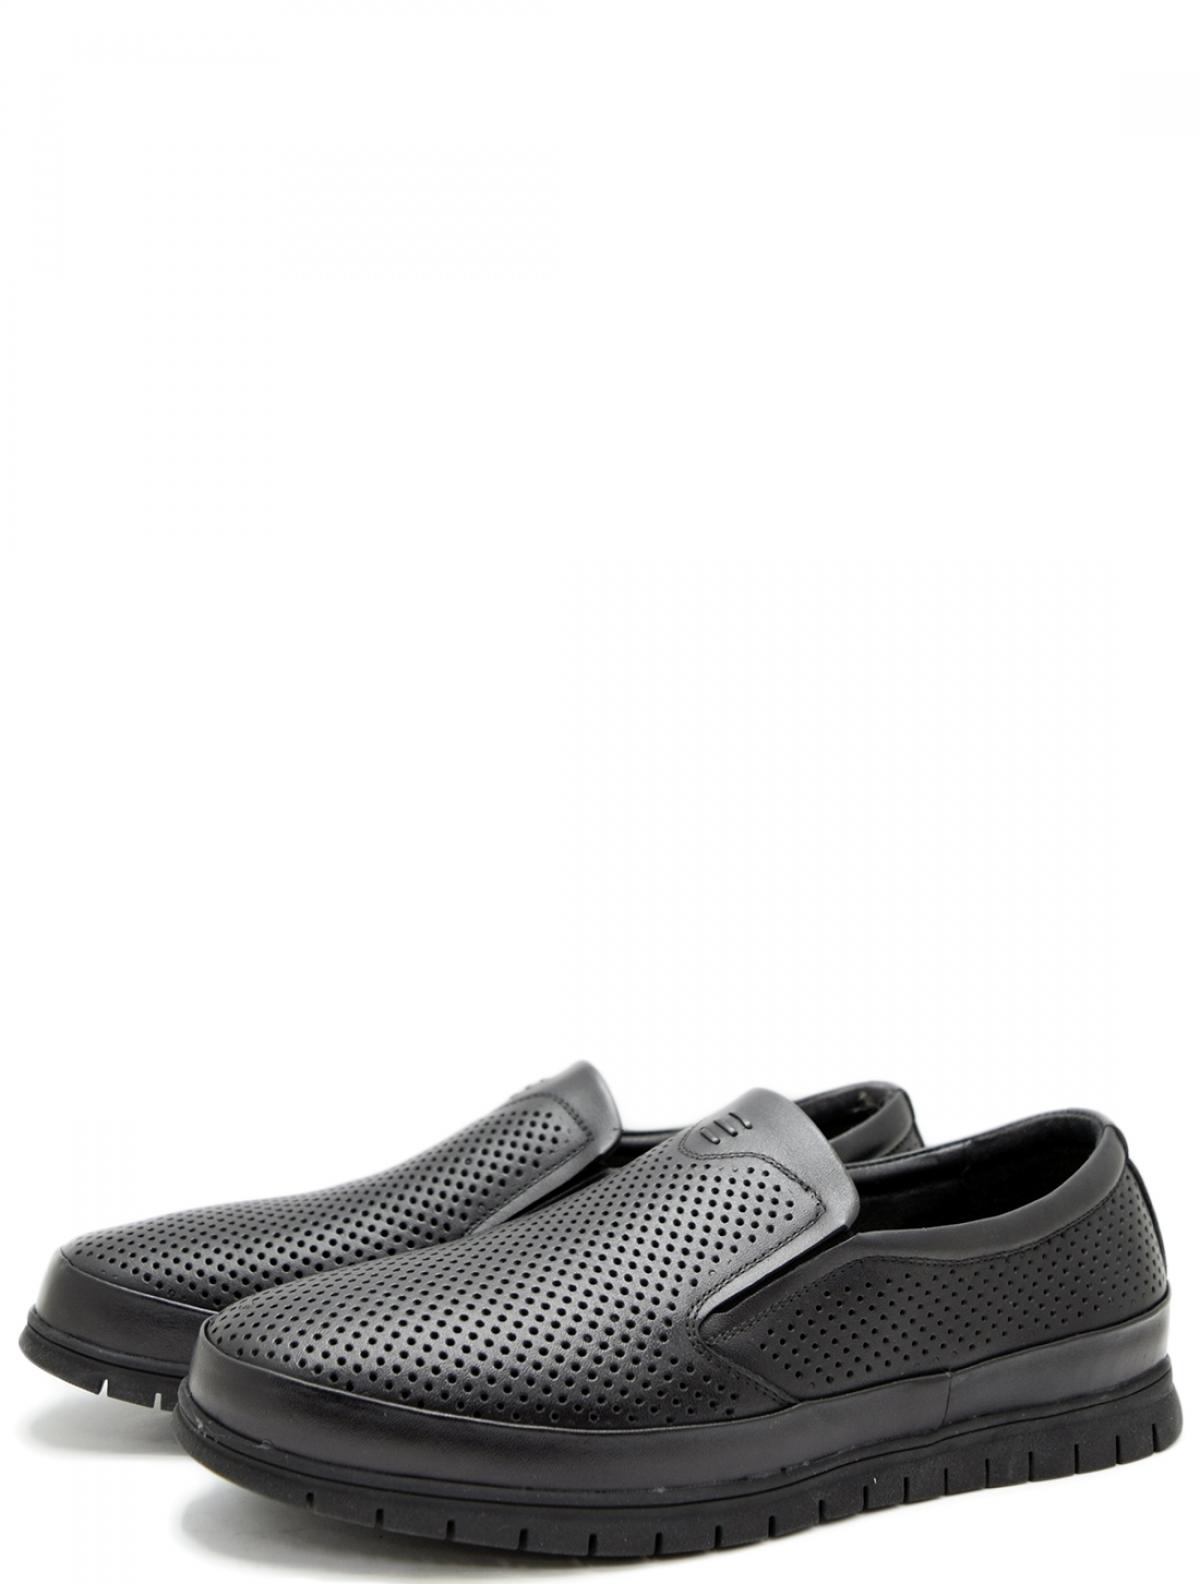 Baden R025-010 мужские туфли